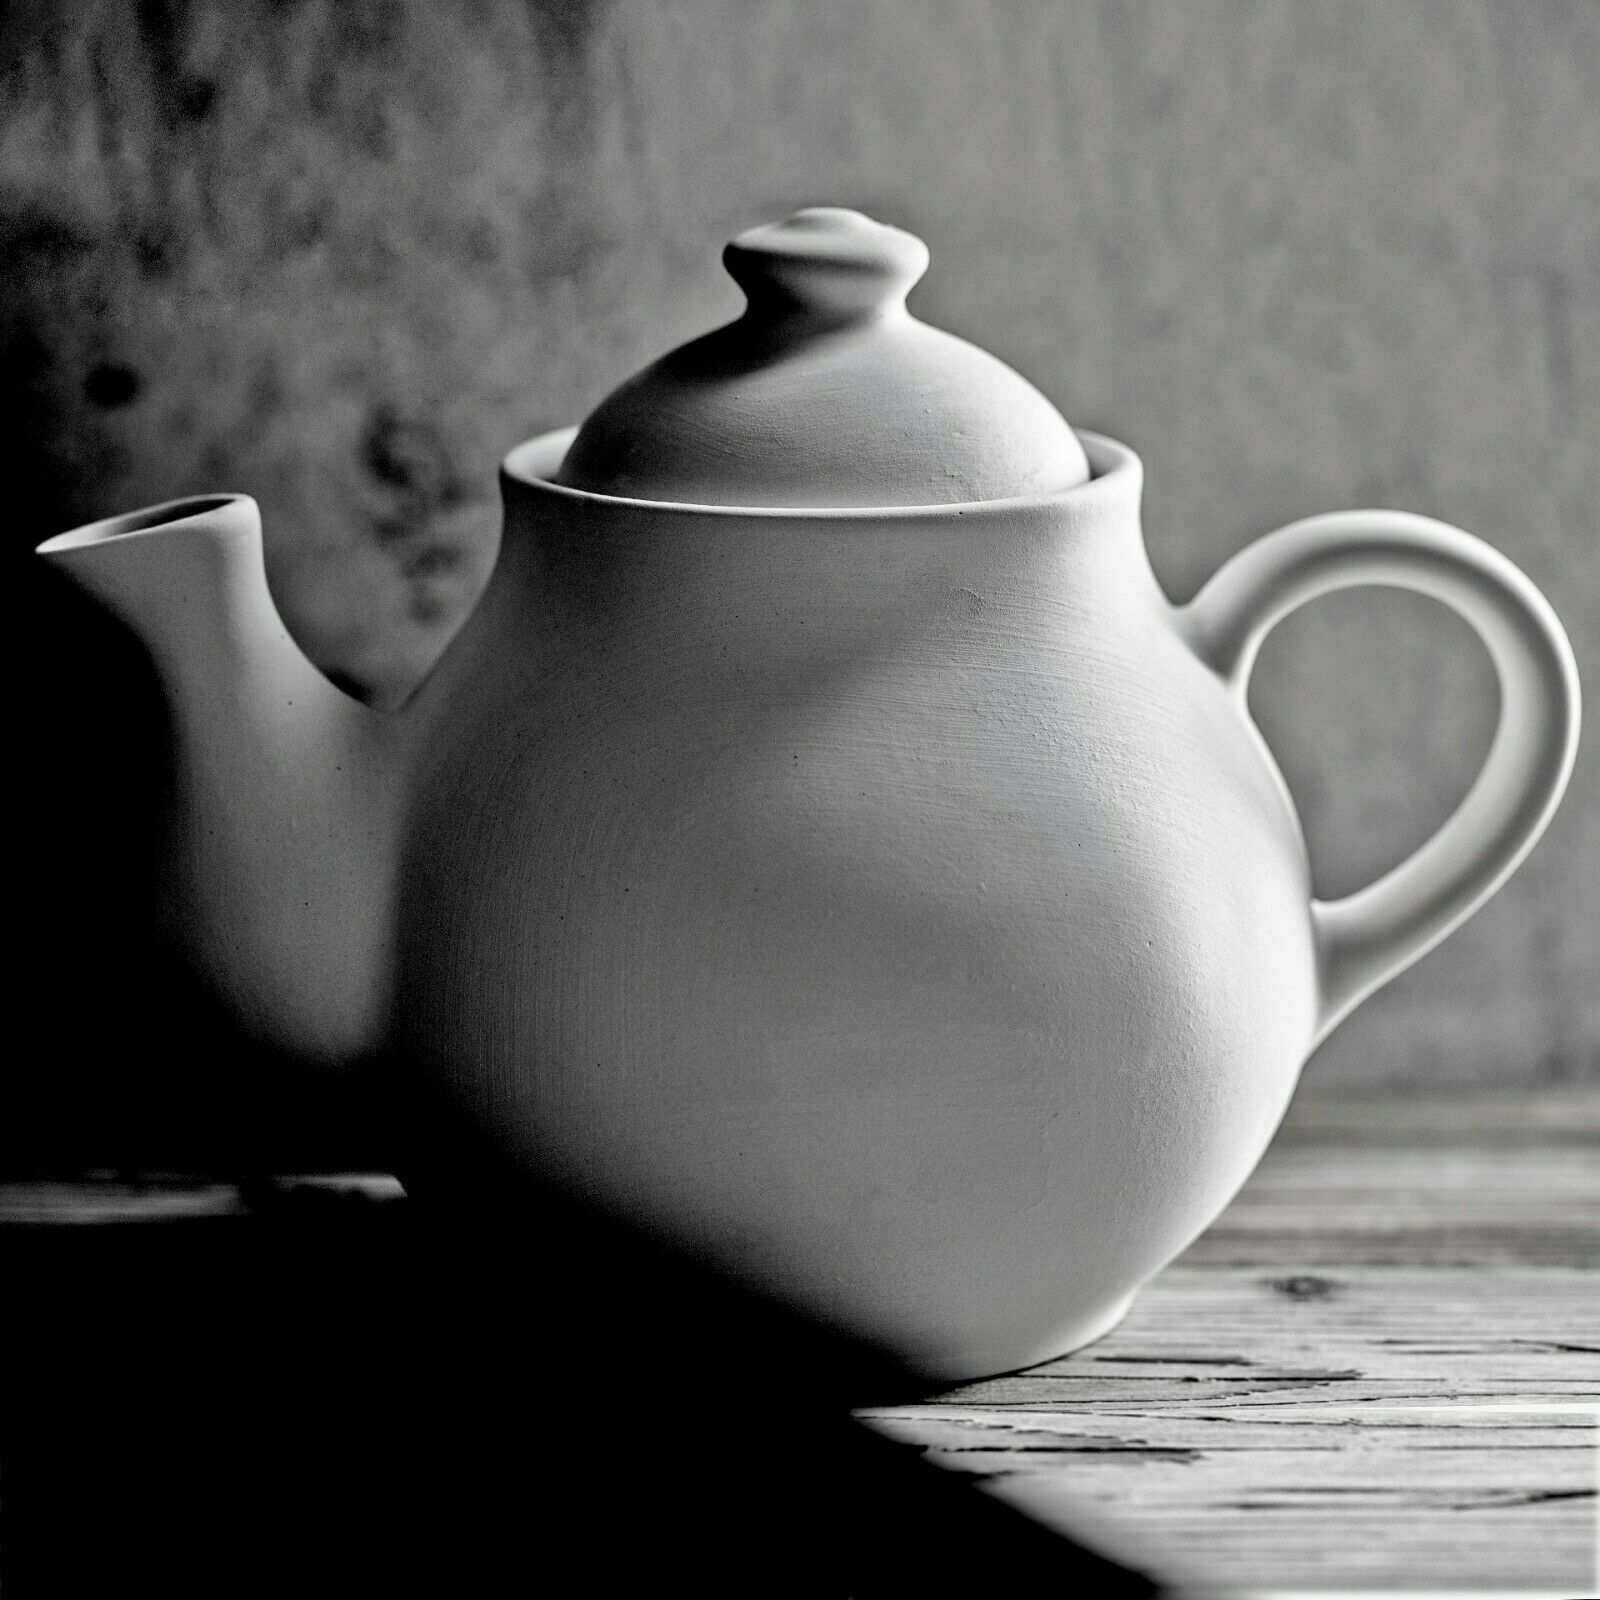 Handmade Teal Blue and WhitePolka Dot Extra Large 60oz//1,7l Ceramic Teapot